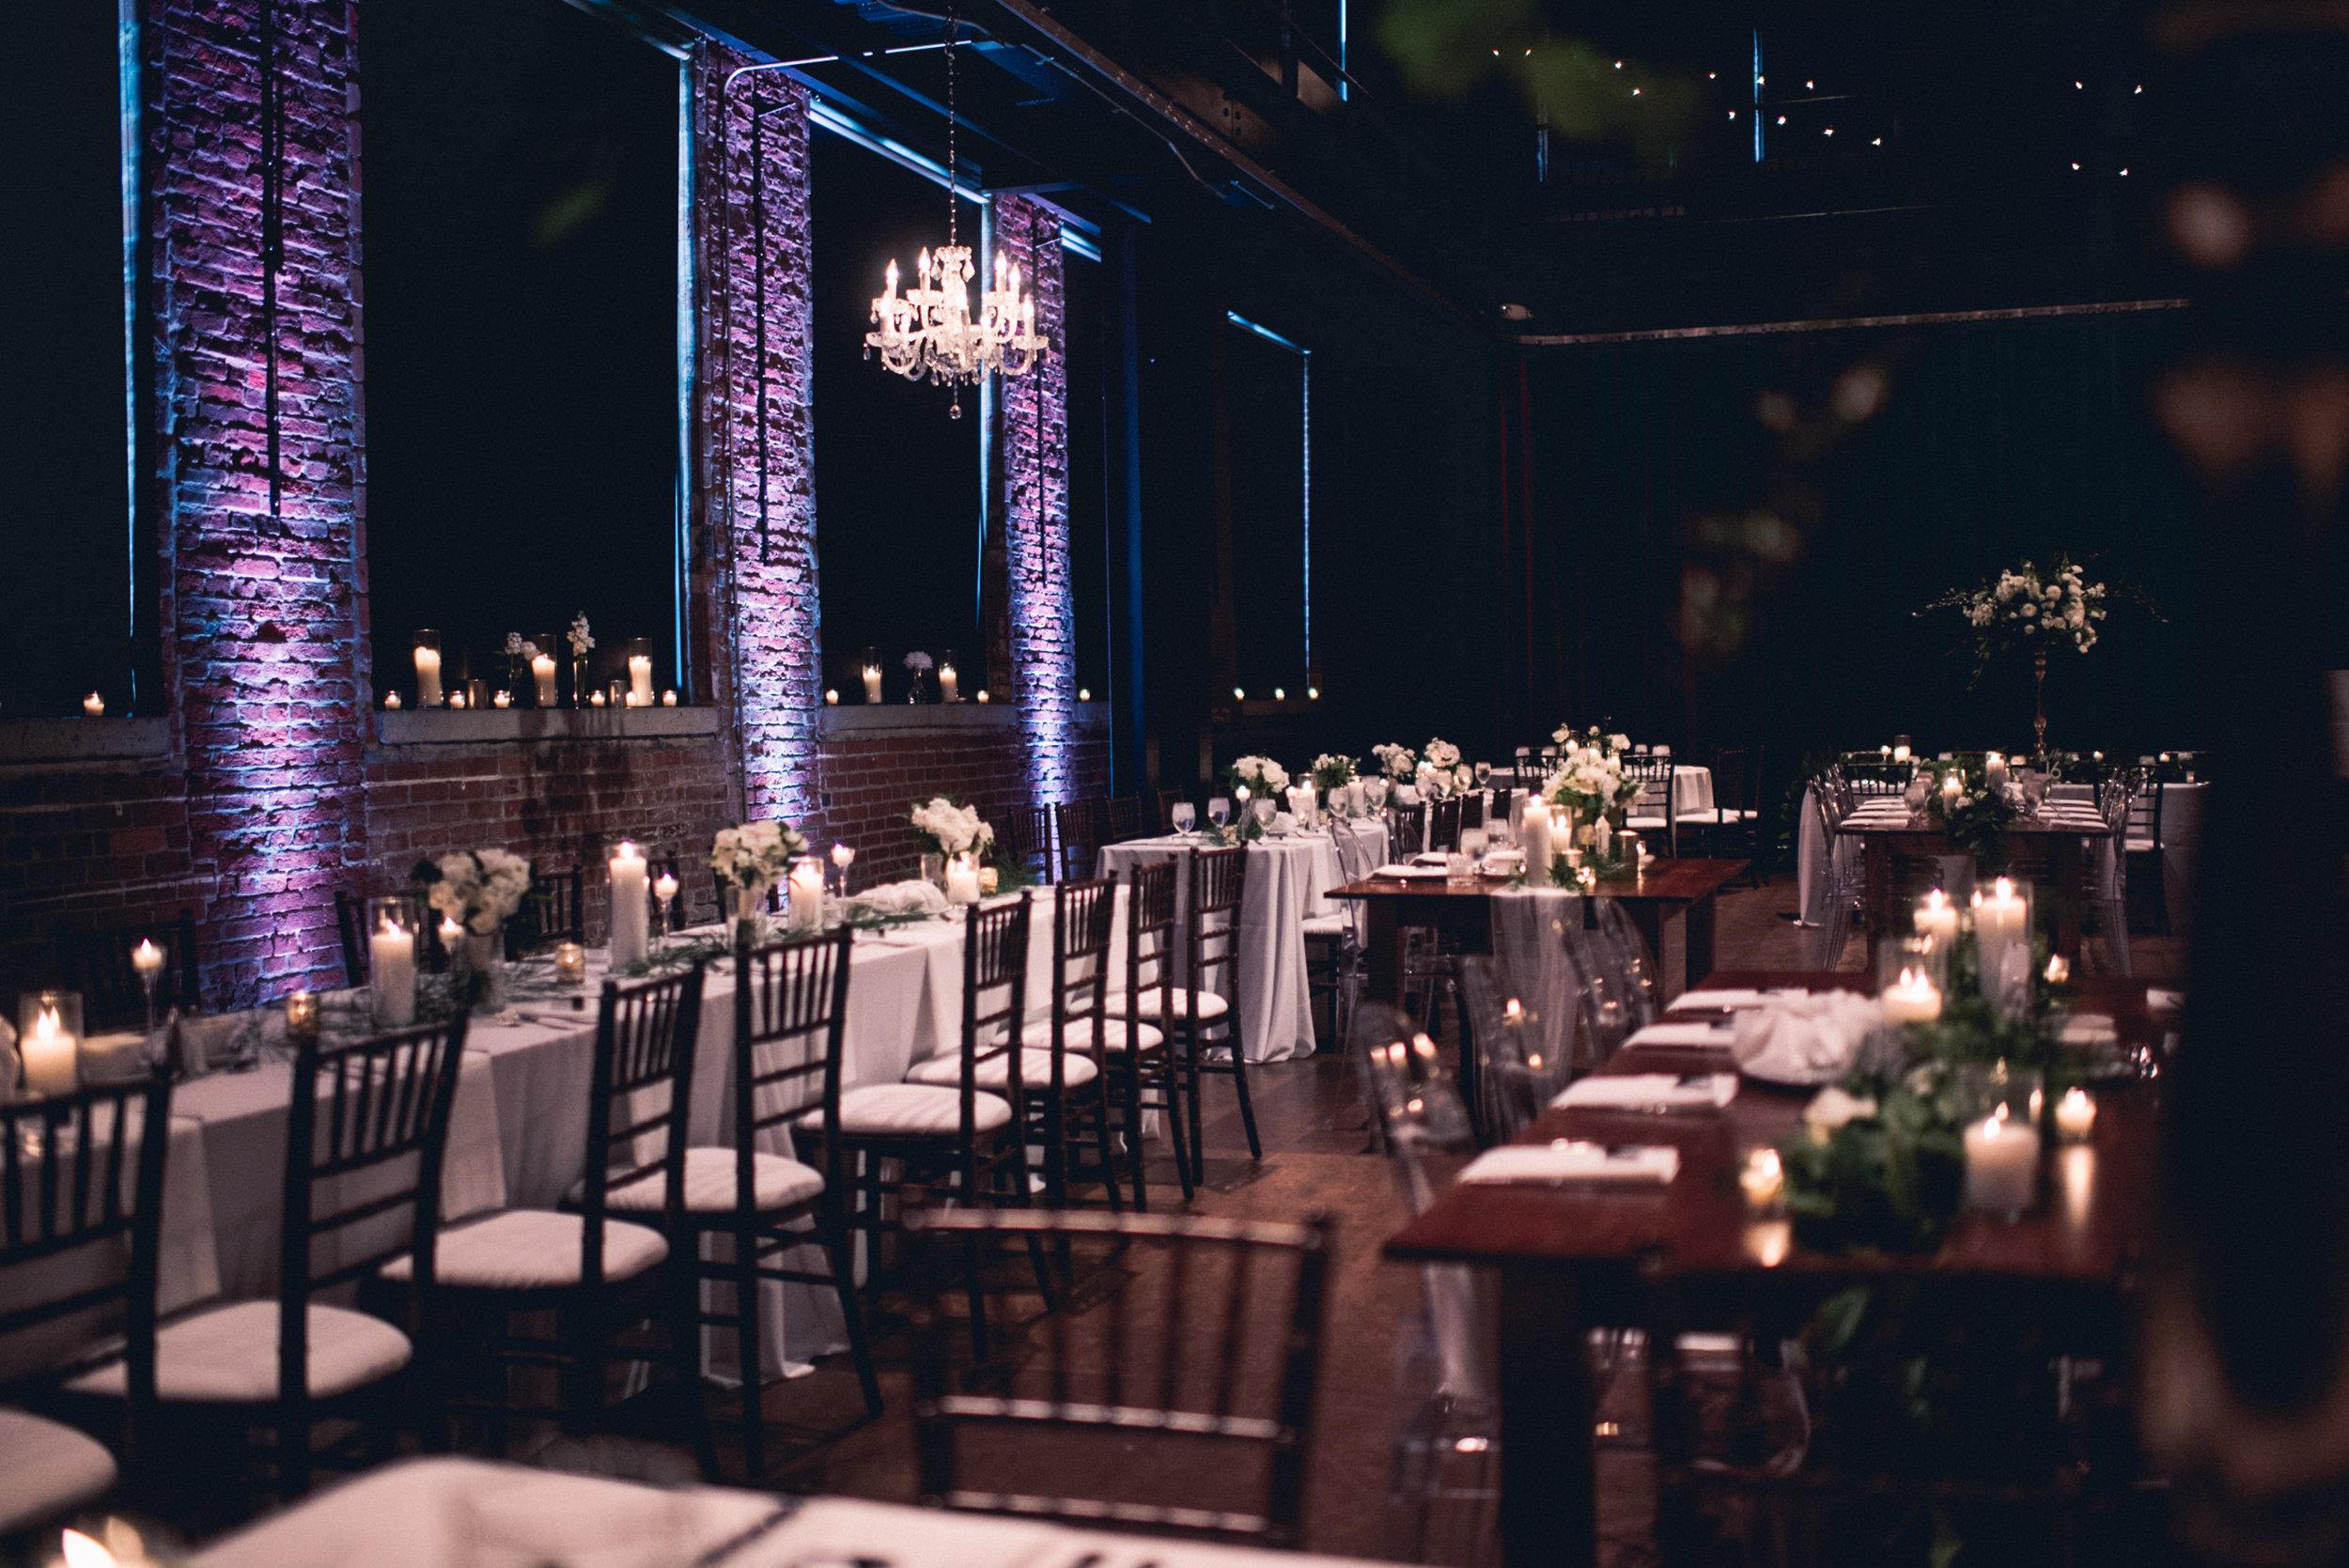 Pittsburgh Pennsylvania New York NYC Wedding Photographer Photojournalist Luxury Downtown Opera - Stirpe 1147.jpg